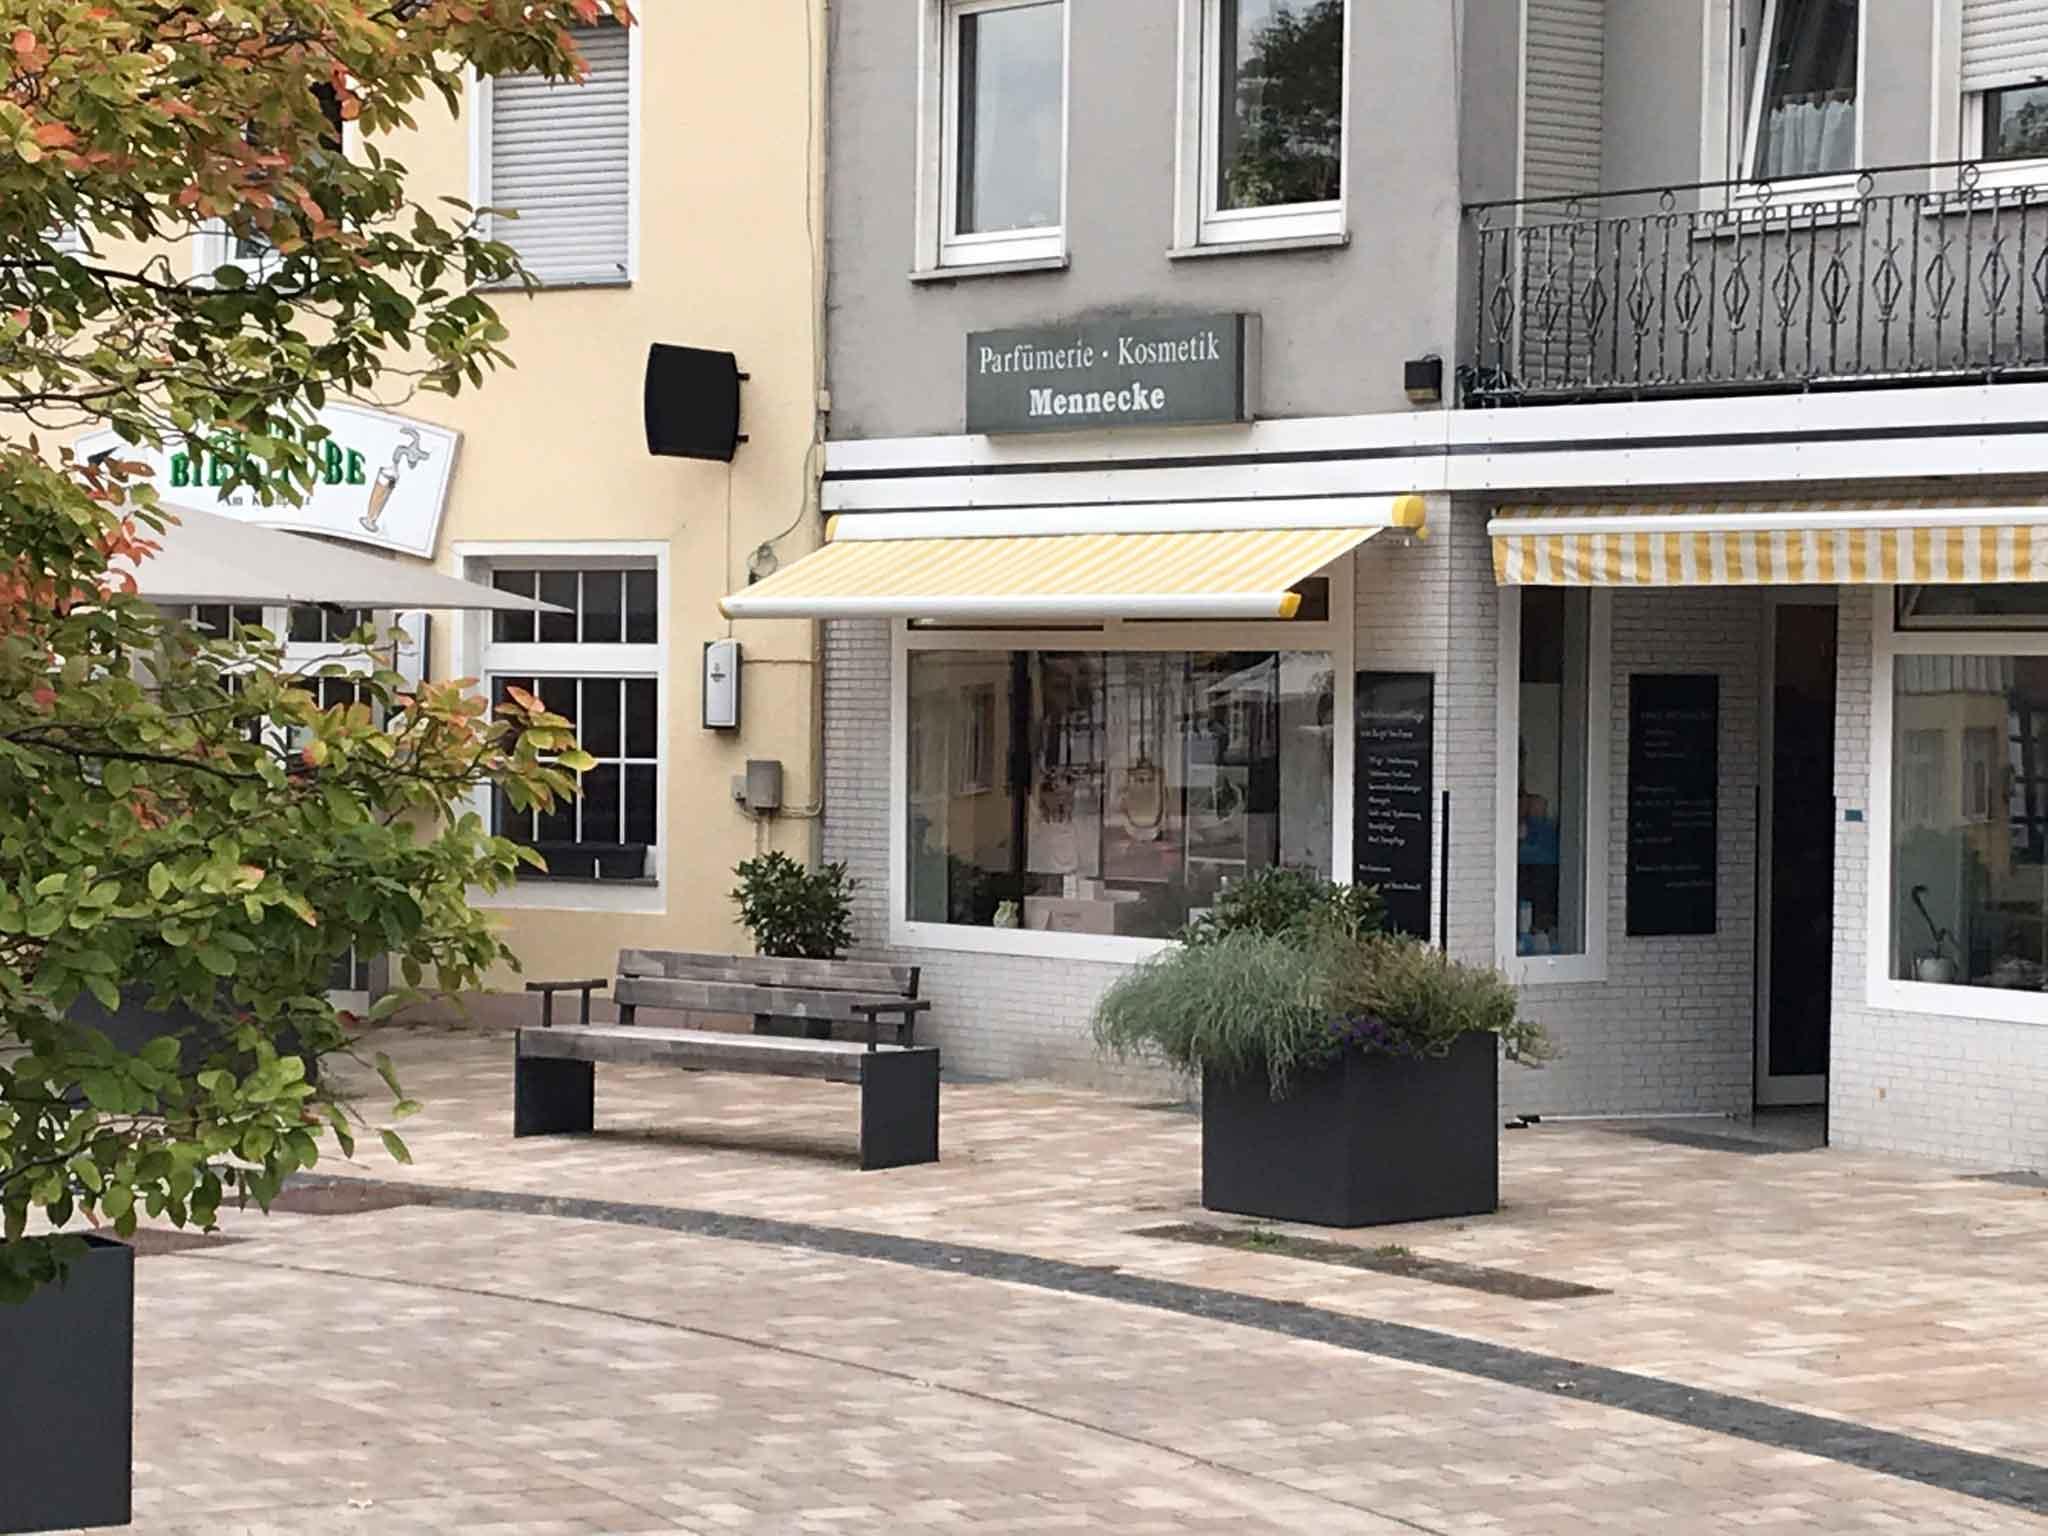 Parfümerie Anke Mennecke Das Geschäft Schaufenster Kirchplatz 12 Steinhagen